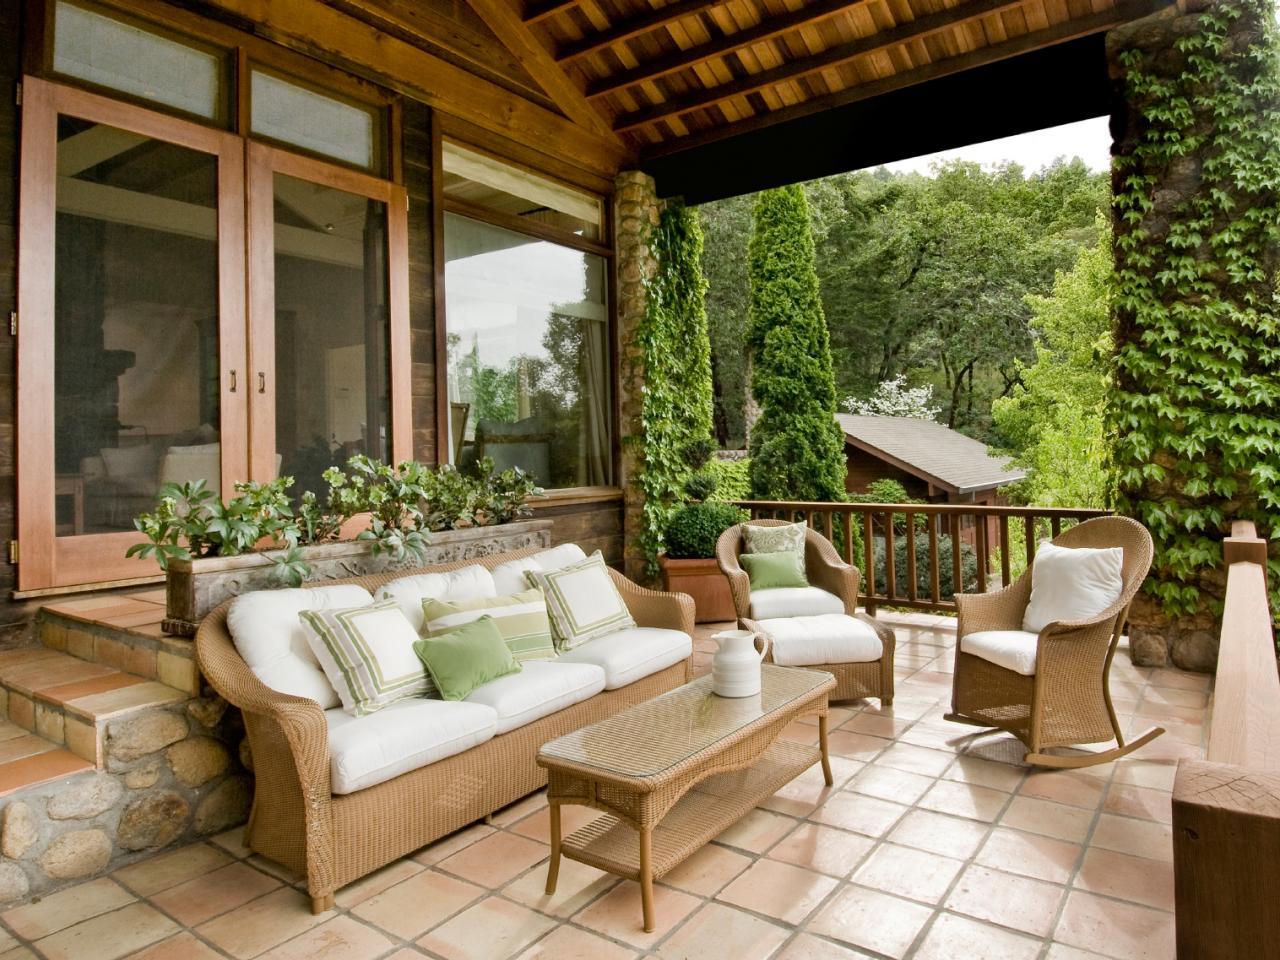 Luxury Under Foot: Outdoor Flooring Buyeru0027s Guide   DIY patio flooring options